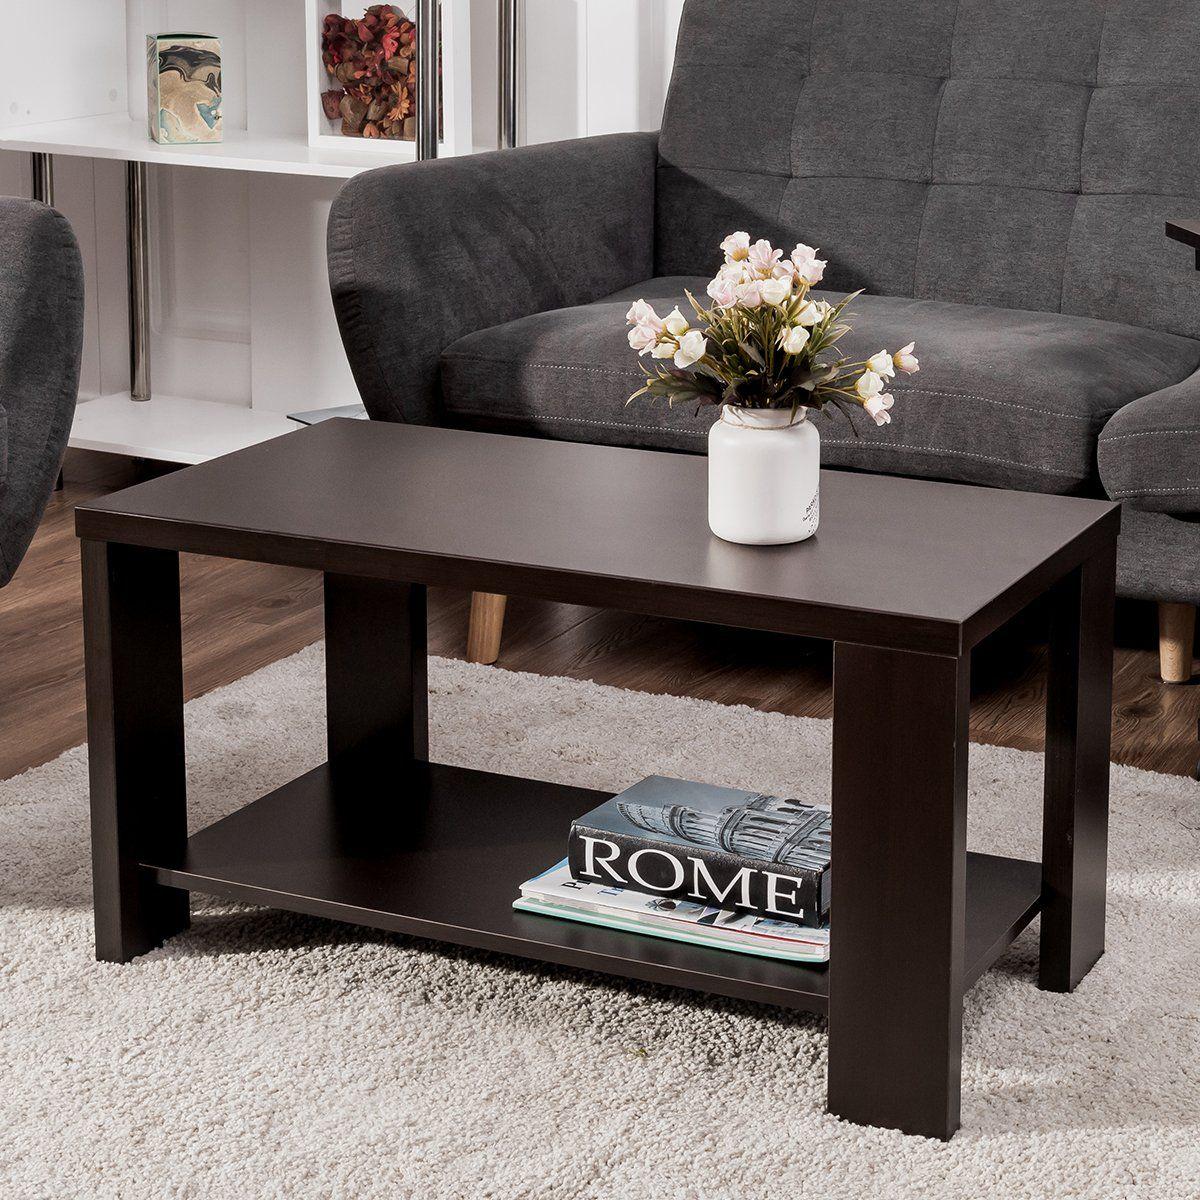 Tangkula Coffee Table Modern Wood Rectangular Living Room Furniture With Storage Shelf En Cocktail Tables Living Room Coffee Table Modern Furniture Living Room [ 1200 x 1200 Pixel ]